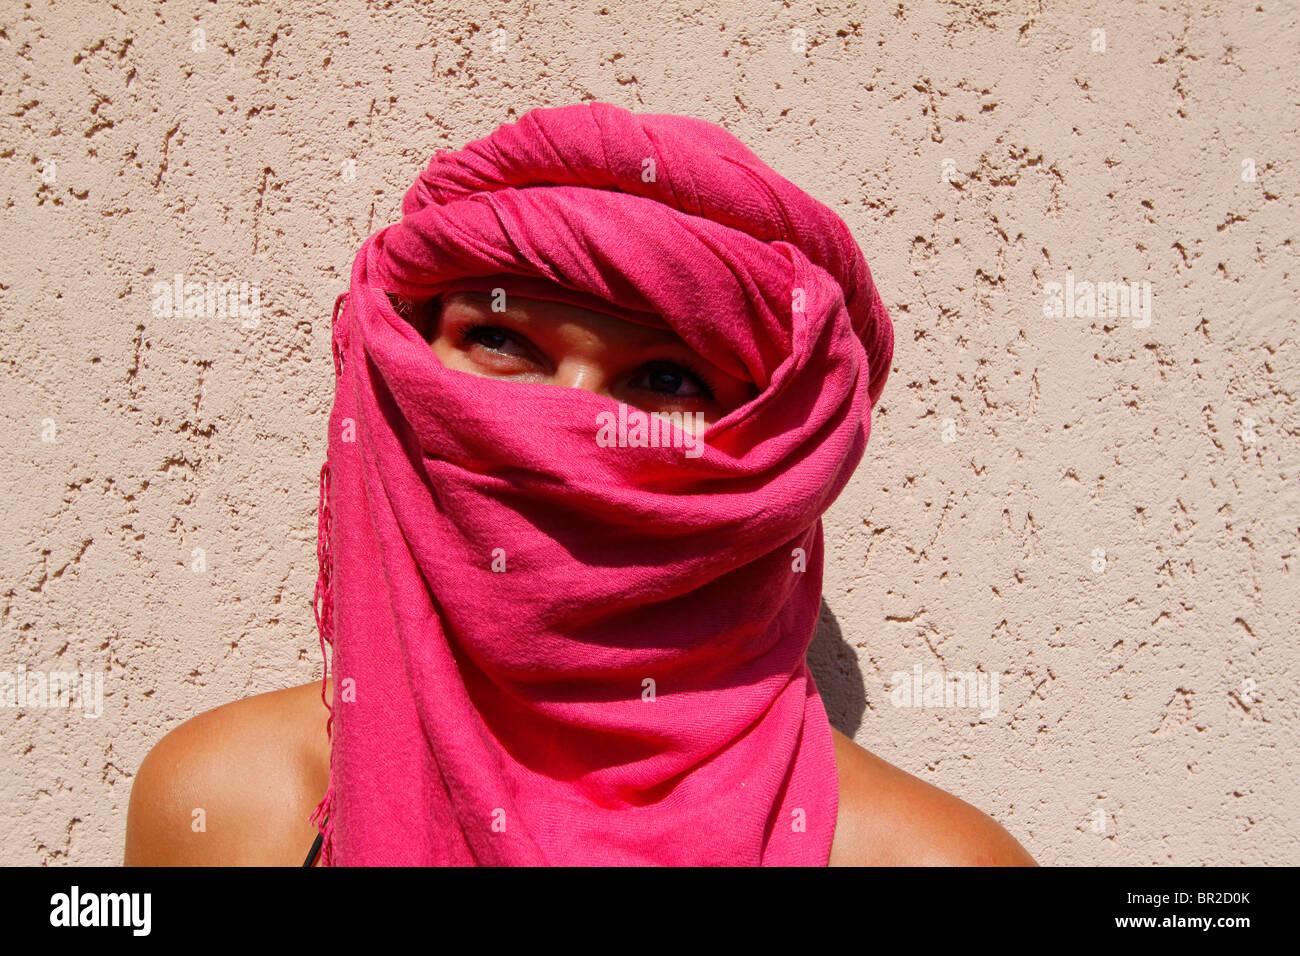 Girl Wearing Pink Headscarf - Stock Image